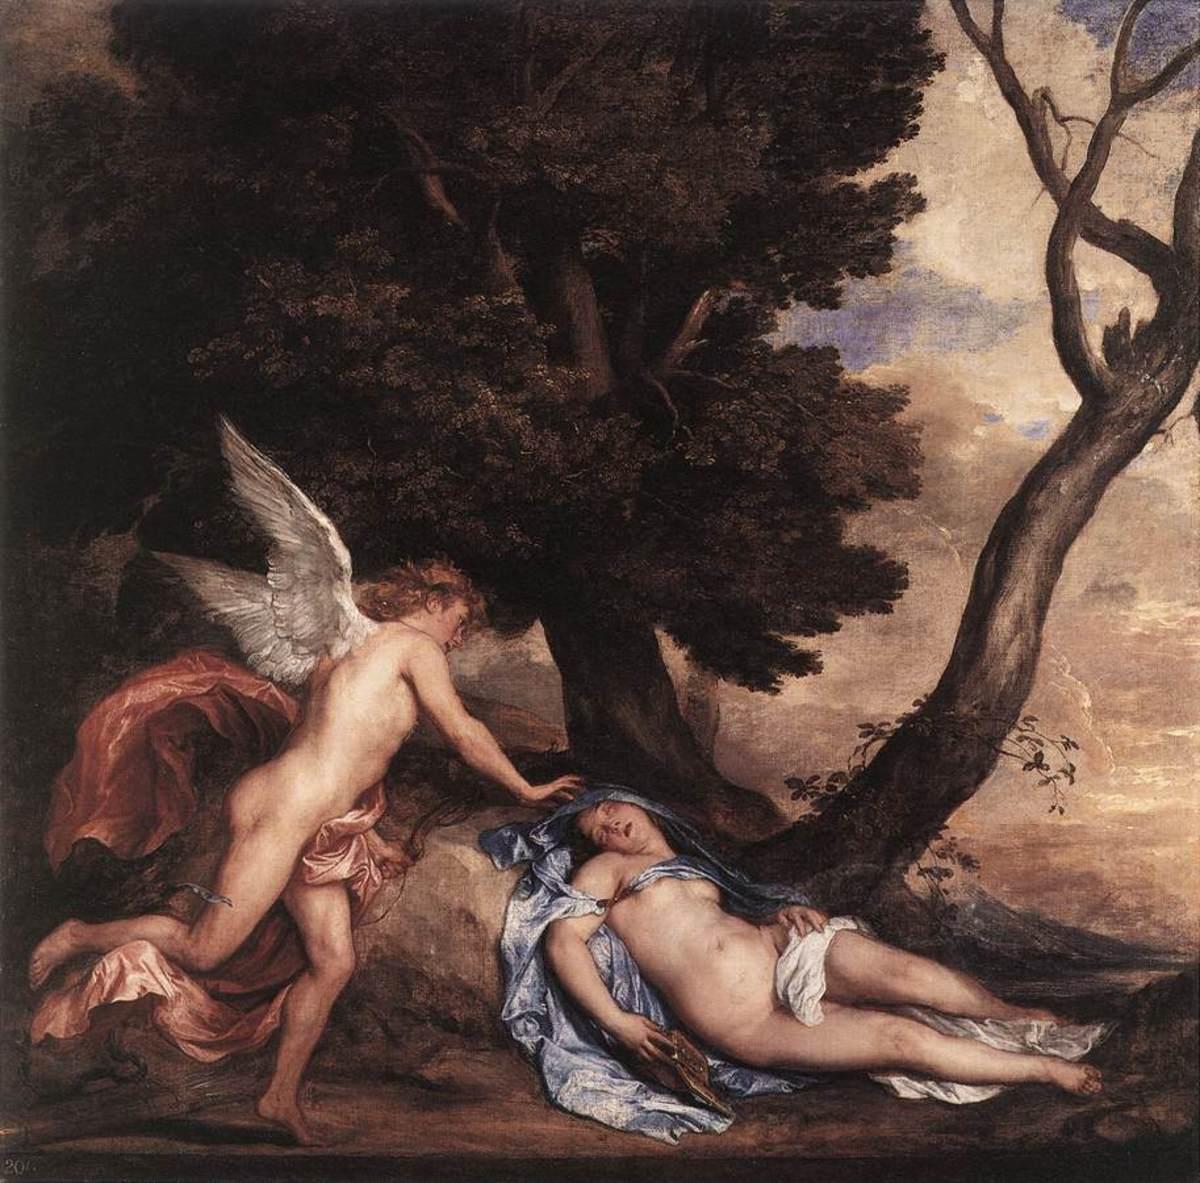 Eros finds Psyche, asleep.